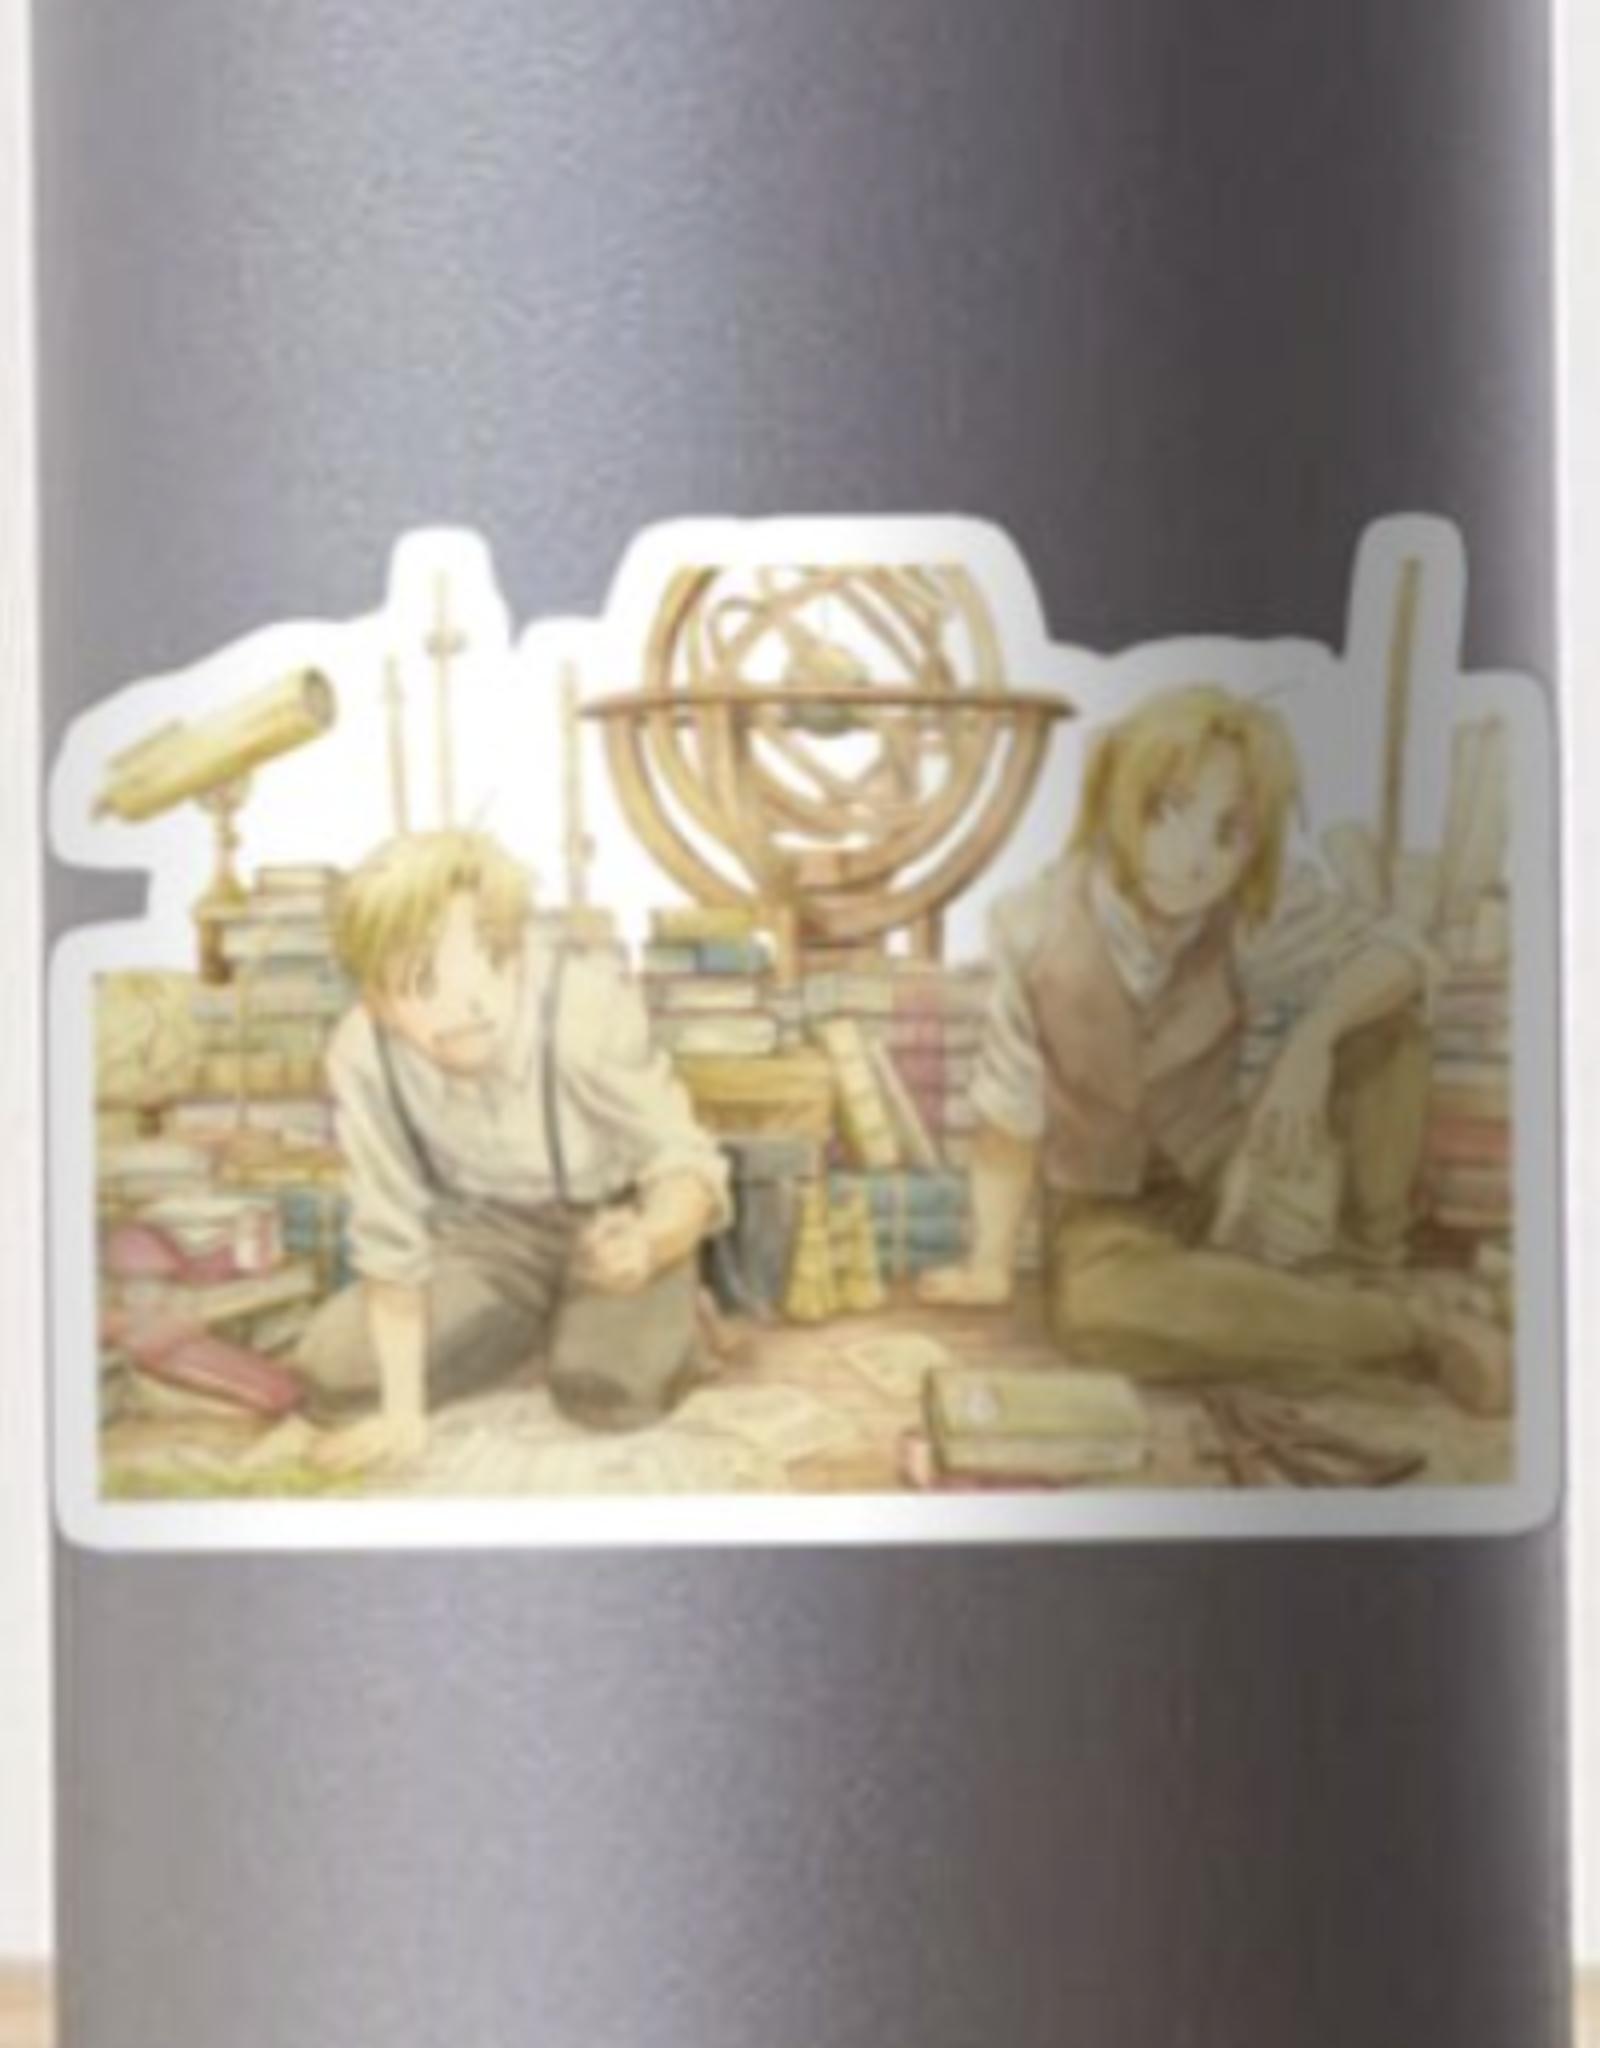 Edward and Alphonse Elric Sticker